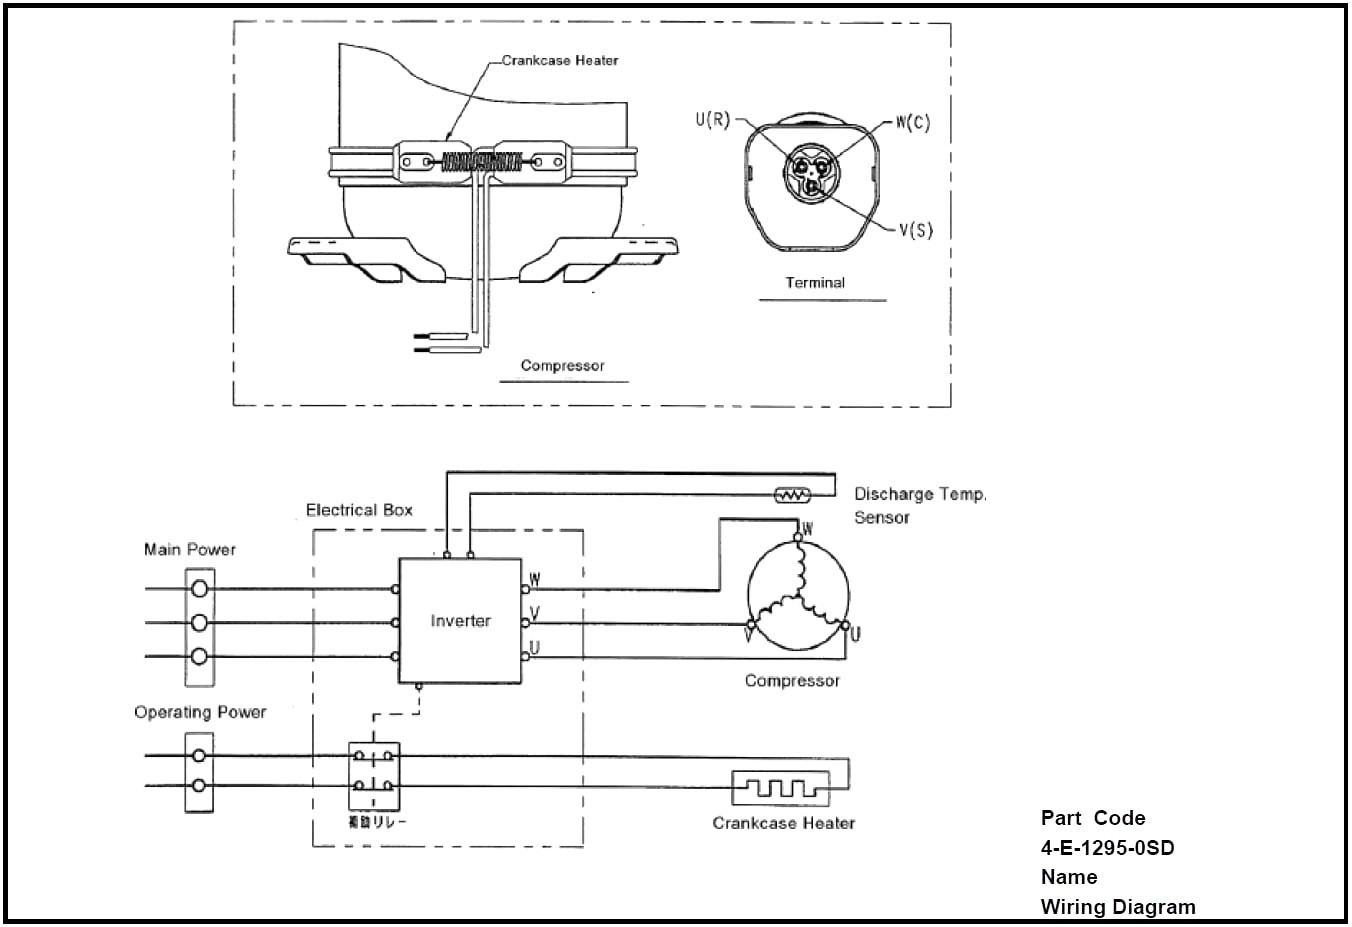 Diagram Embraco pressor Wiring Aspera Kwikpikme Aermacchi For